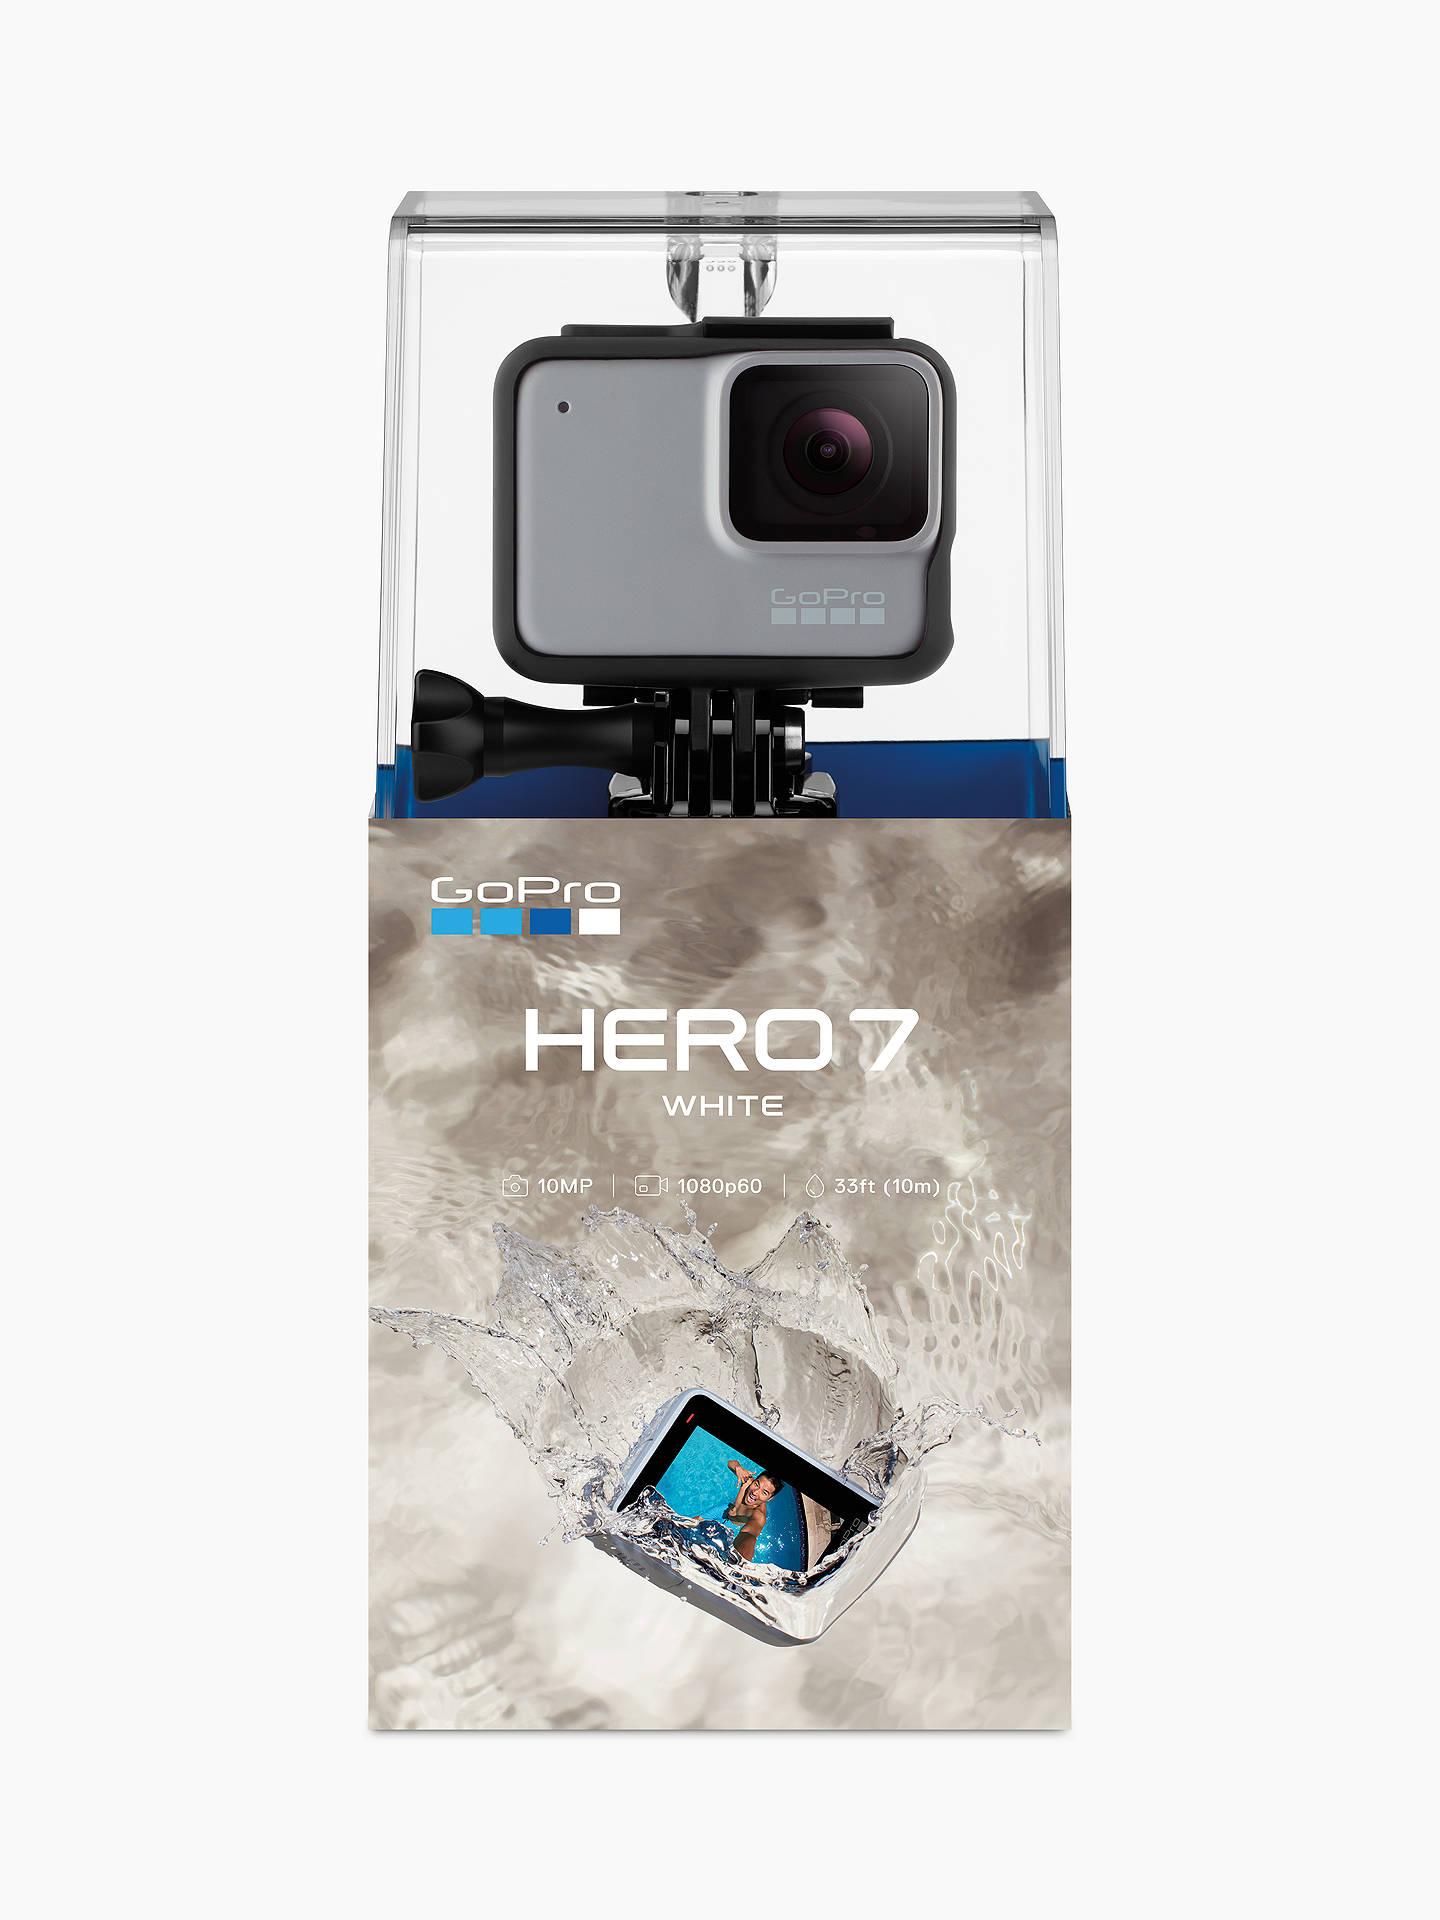 GoPro HERO7 White Camcorder, 1440p, Full HD, 10MP, Wi-Fi, Waterproof